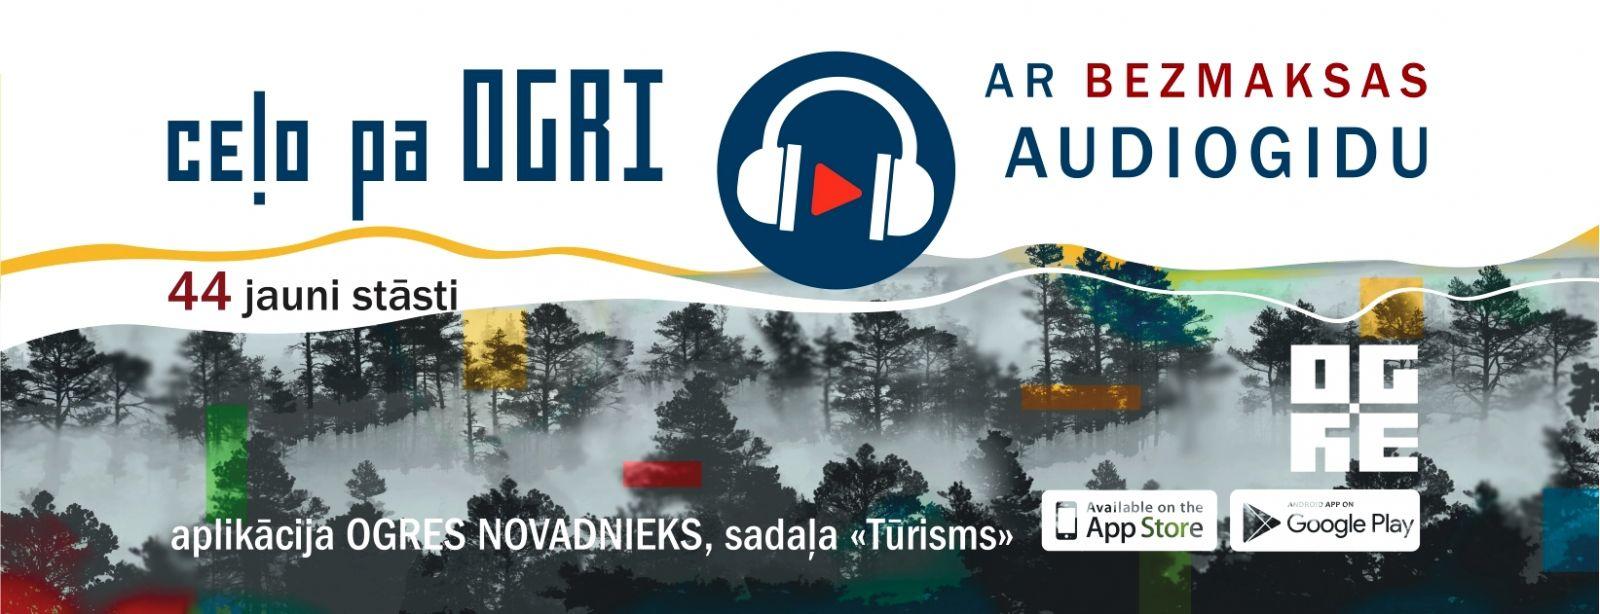 Audiogids